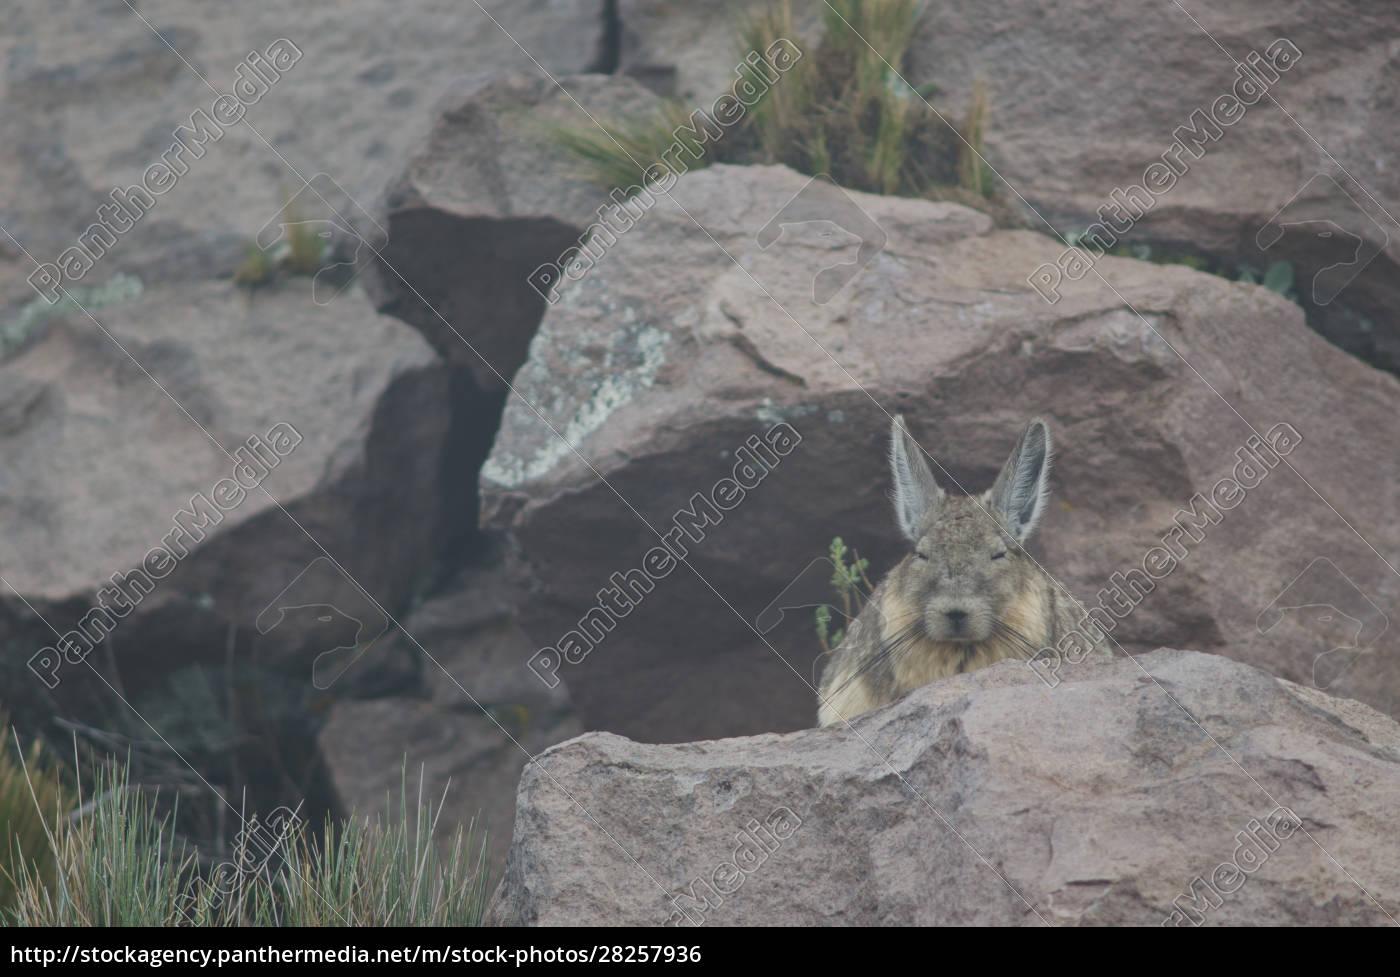 southern, viscacha, lagidium, viscacia, resting, in - 28257936